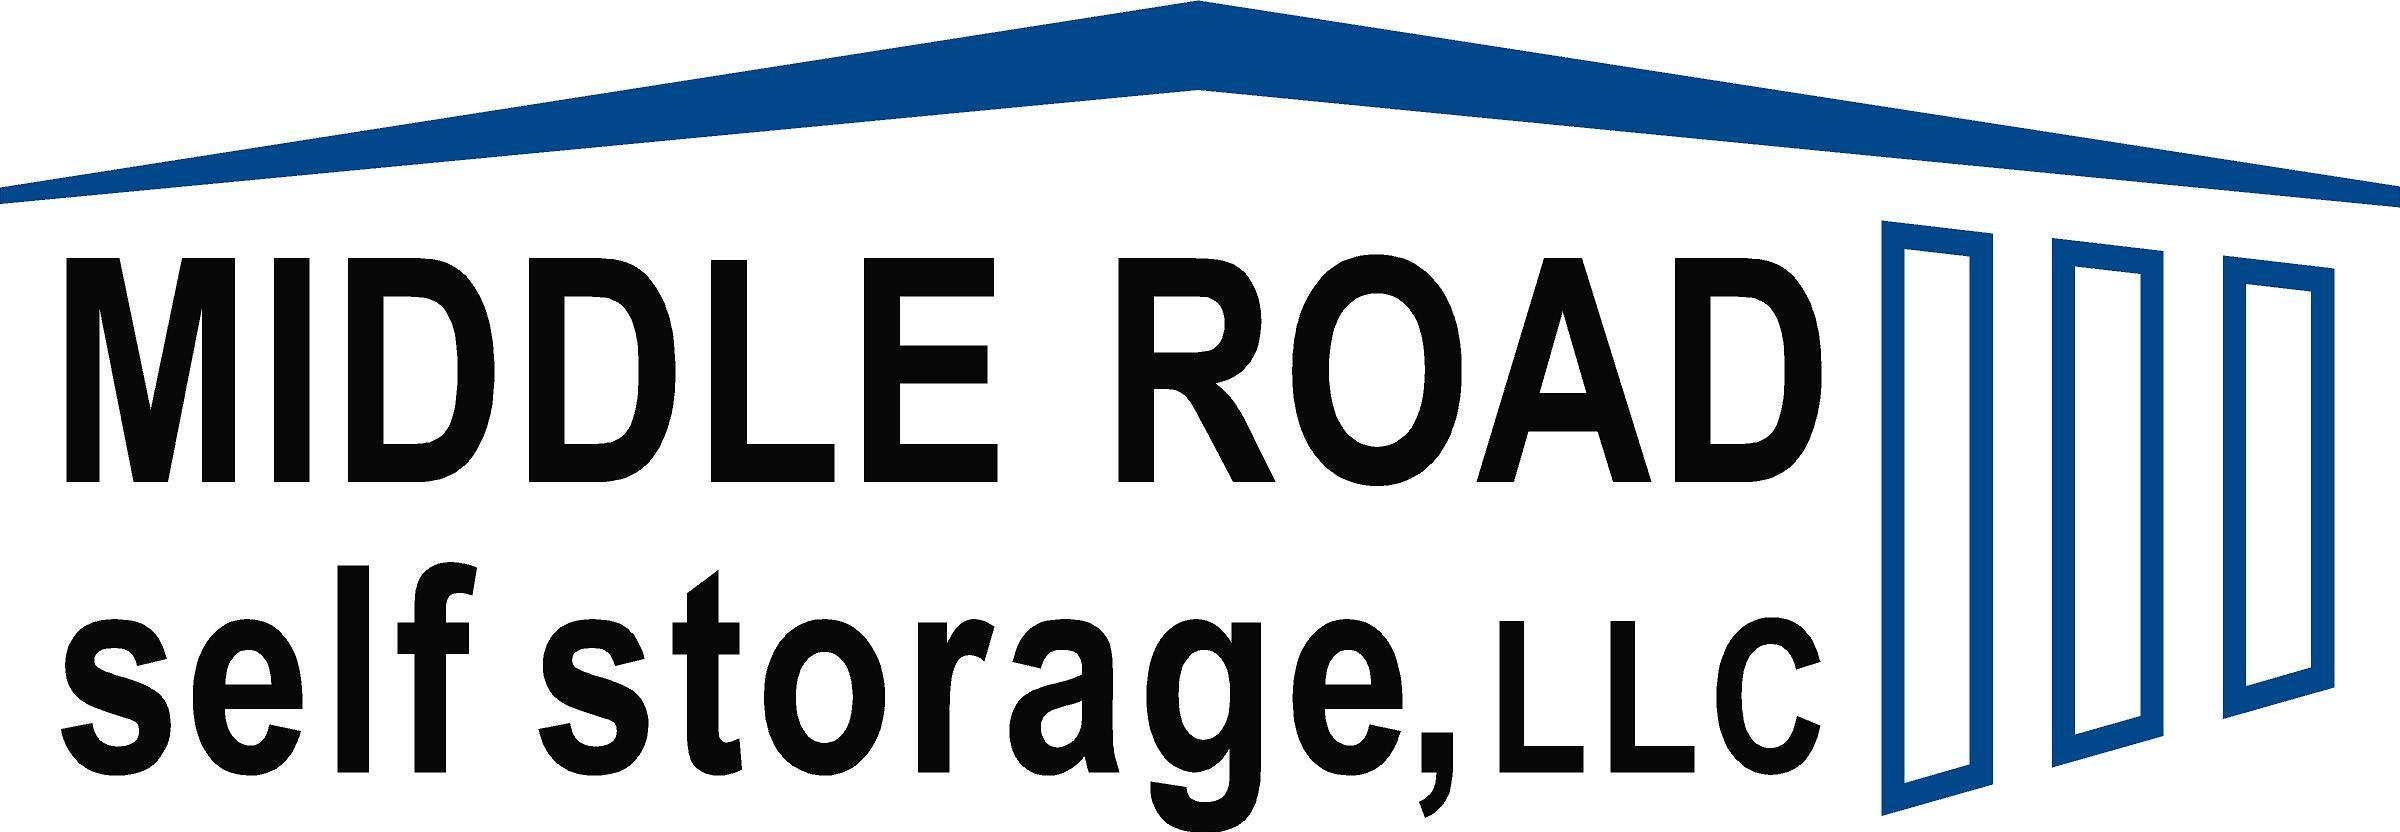 Middle Road Self Storage, LLC